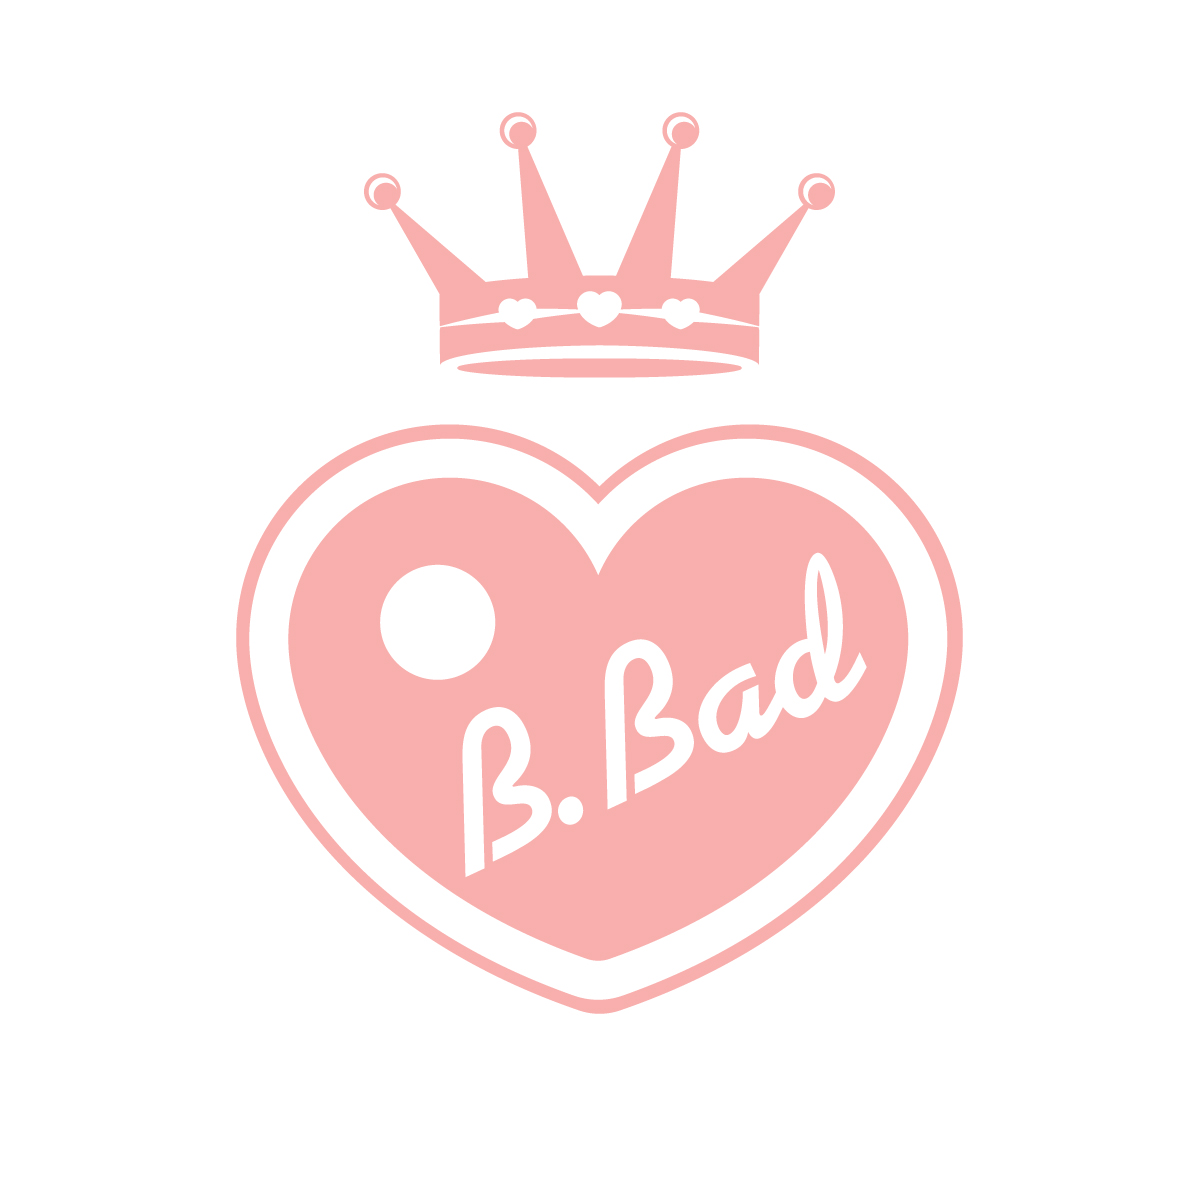 BBad_logo_01.jpg